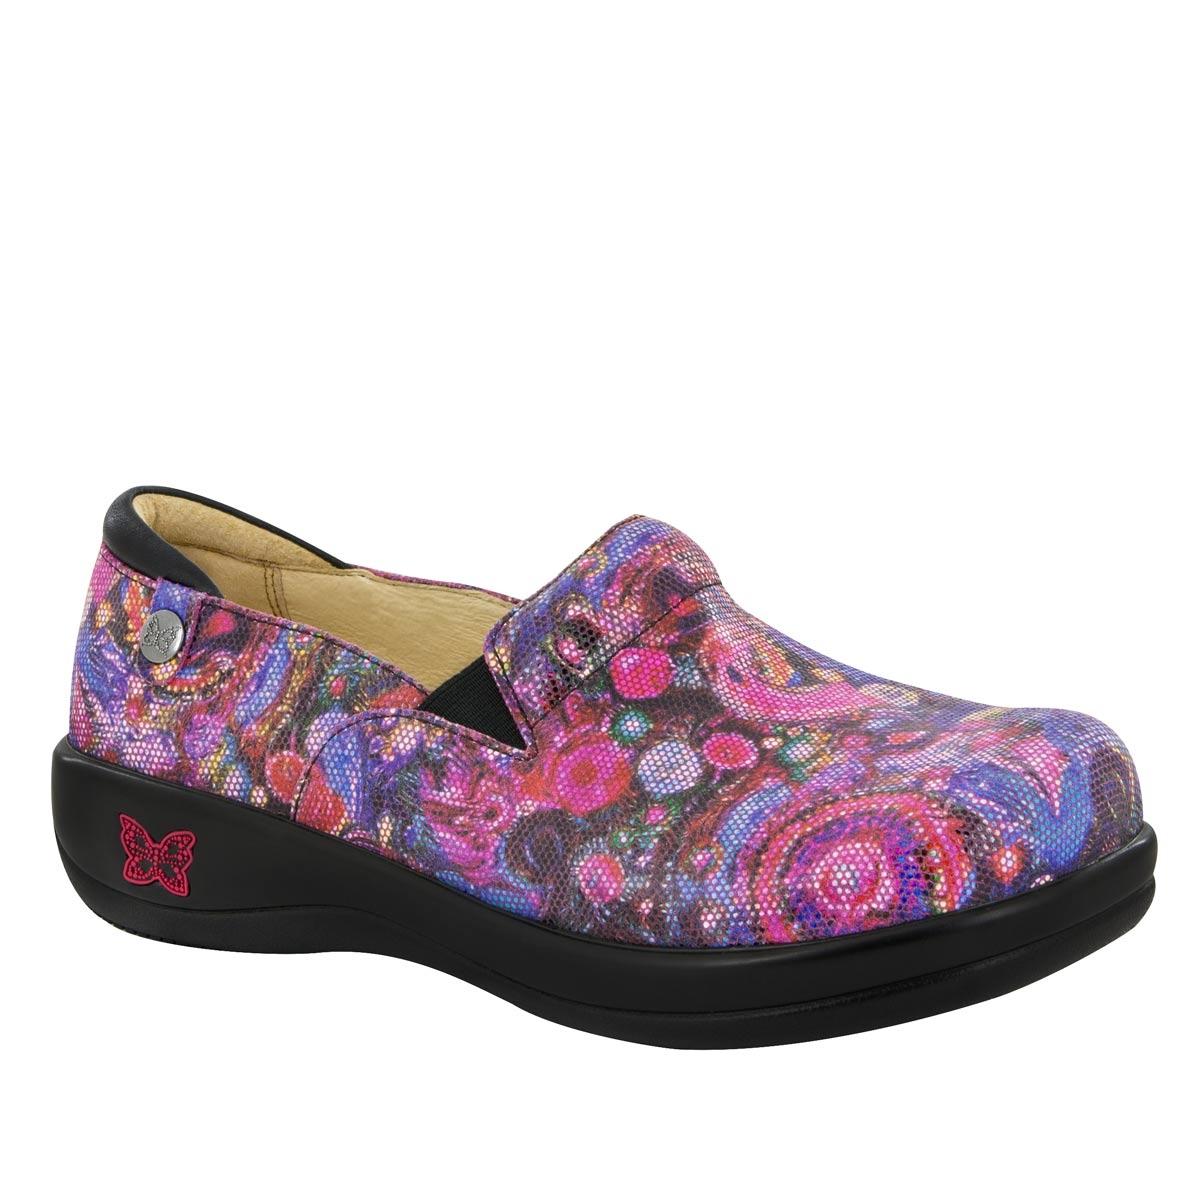 Alegria Keli Pro Wowie Zowie Comfort Shoe Free Shipping